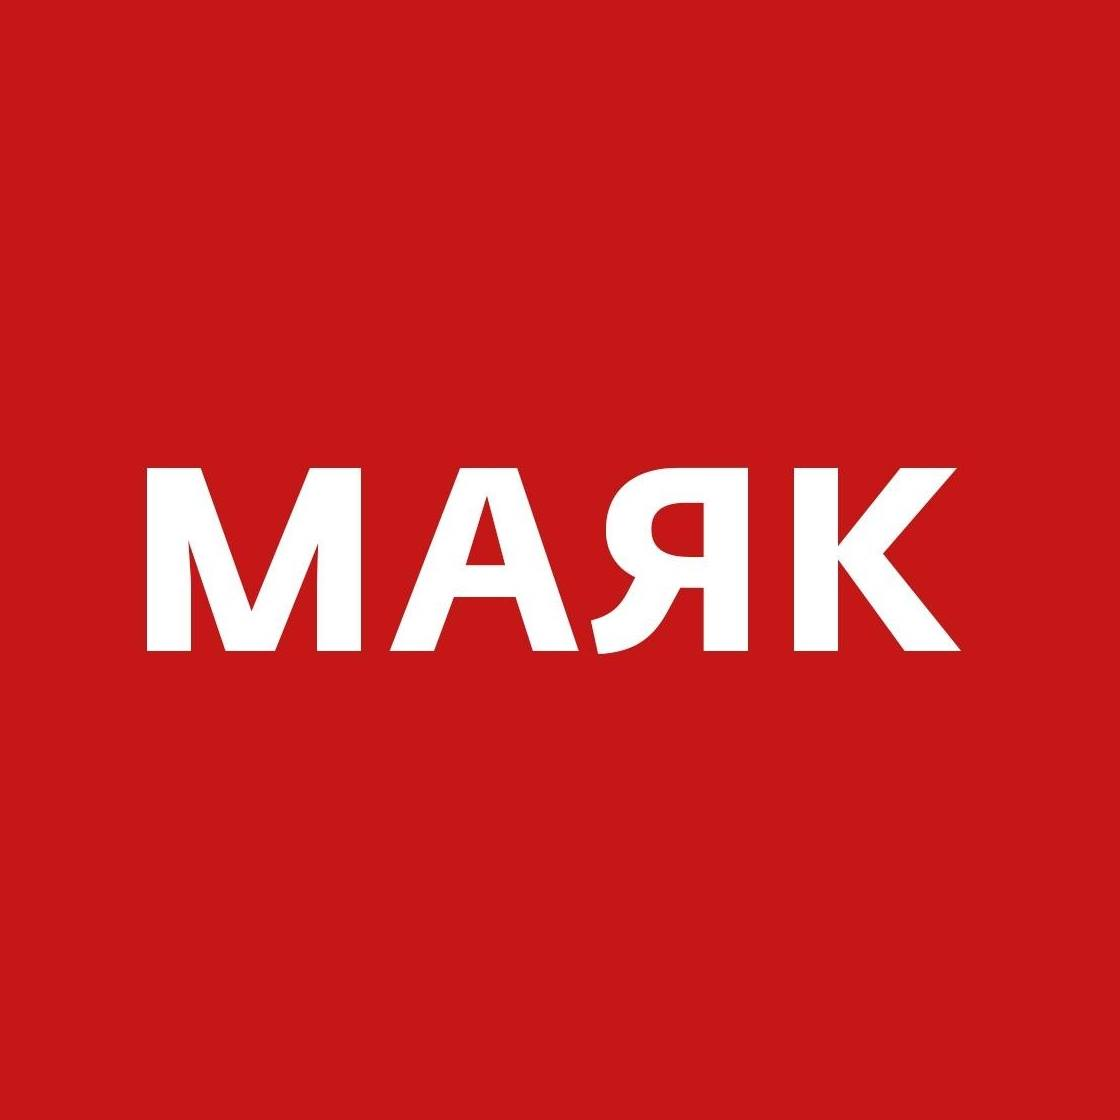 Радио Маяк 66.32 УКВ Россия, Биробиджан